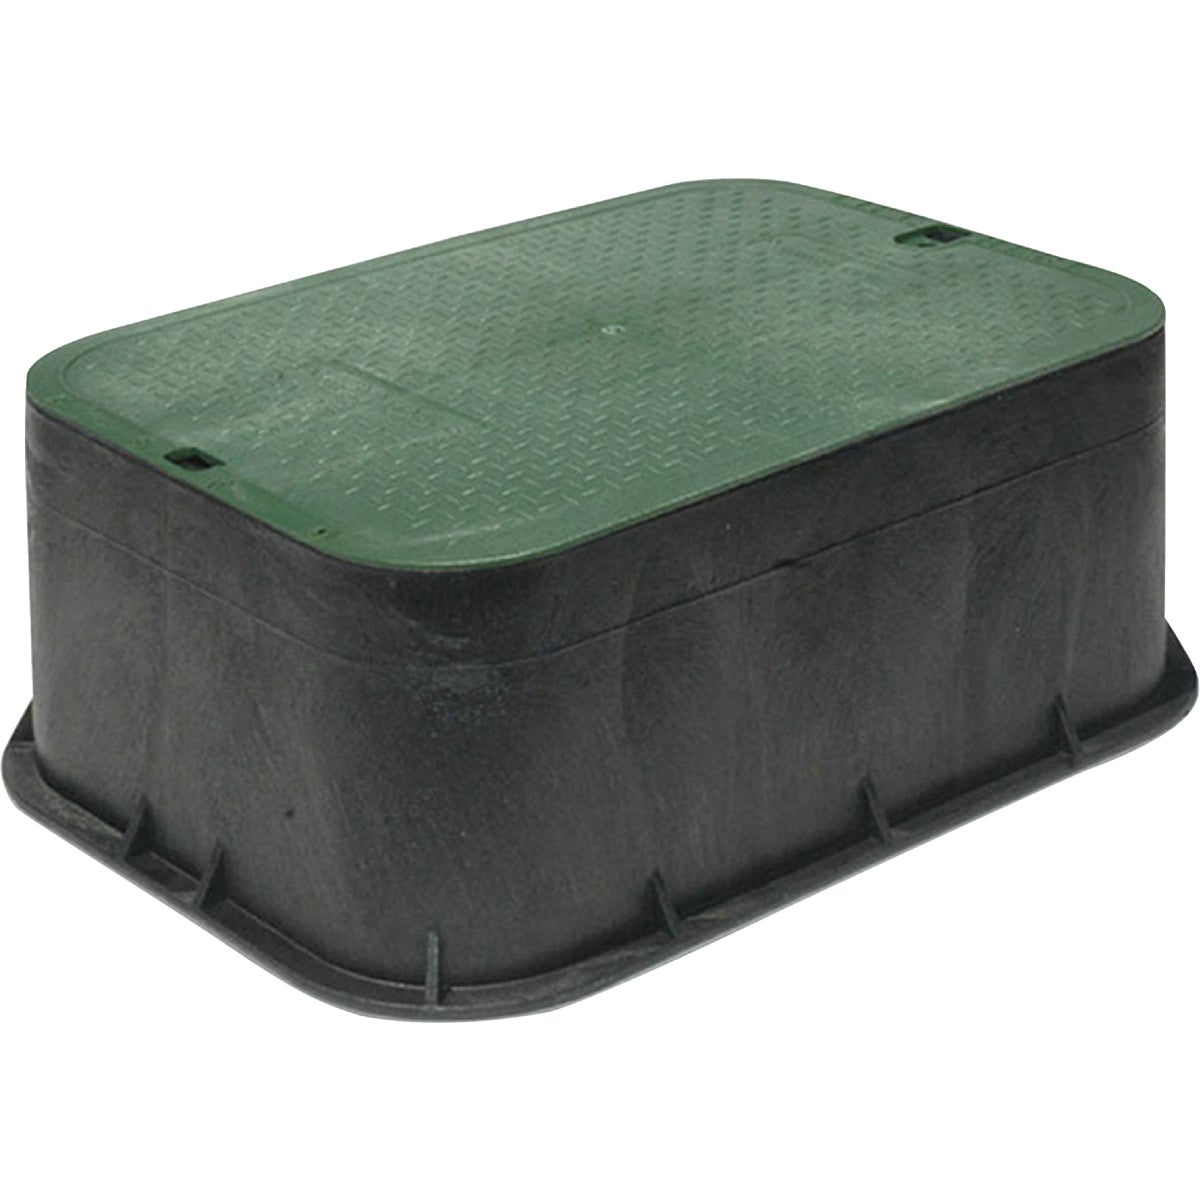 14X19 EXT VALVE BOX